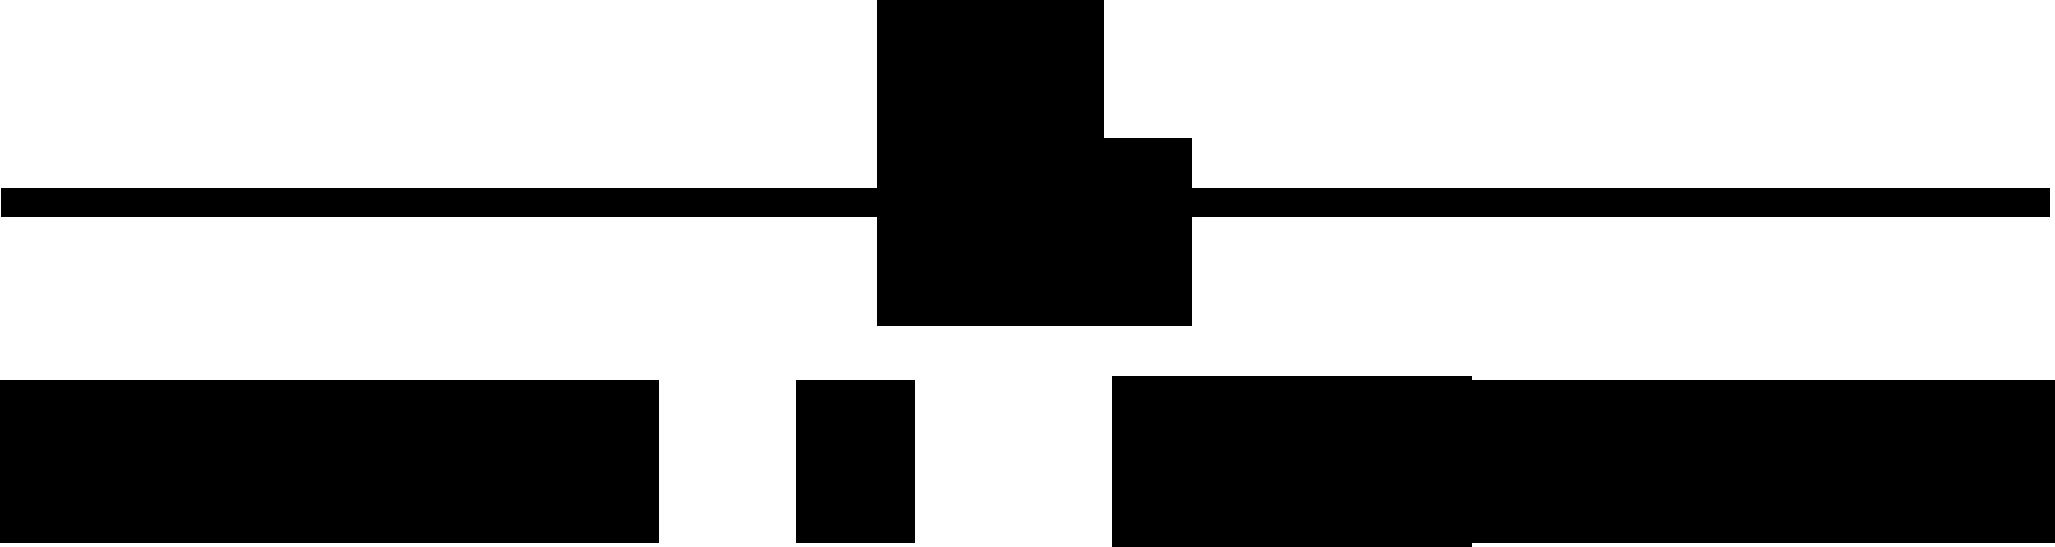 A DARK ORBIT